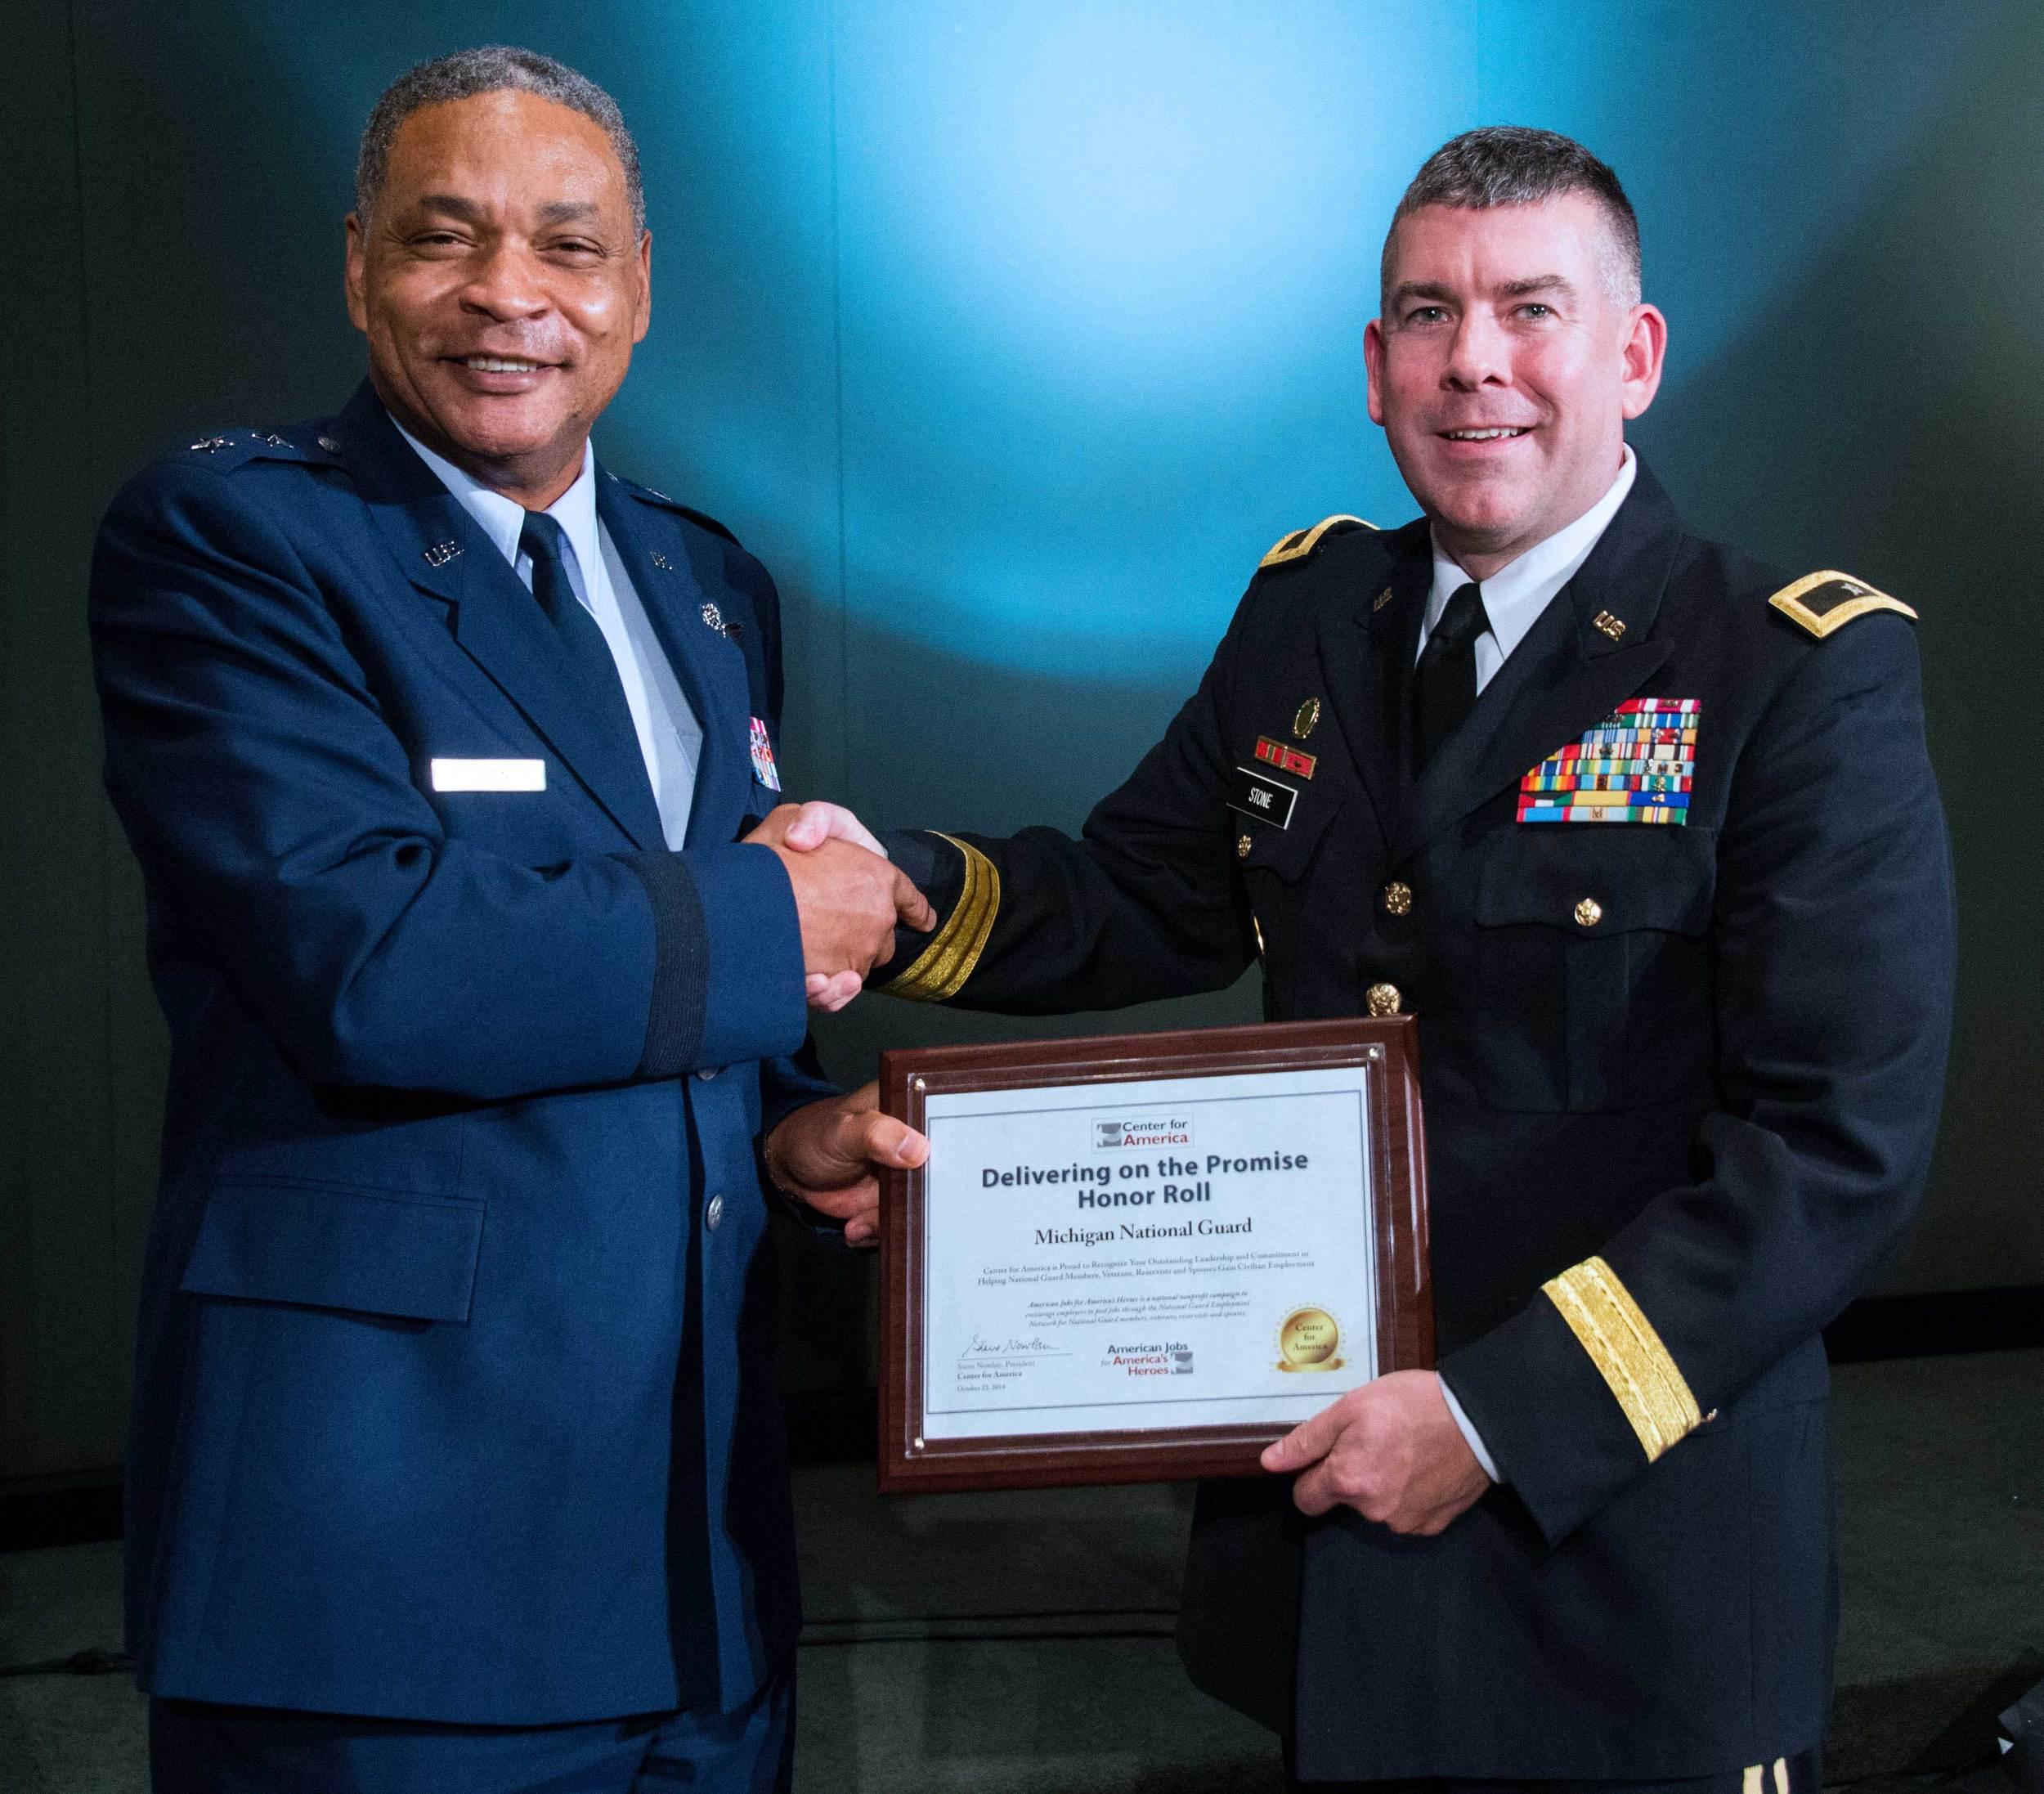 MG Garry Dean presents the CFA Award toBG Michael Stone, Michigan National Guard.